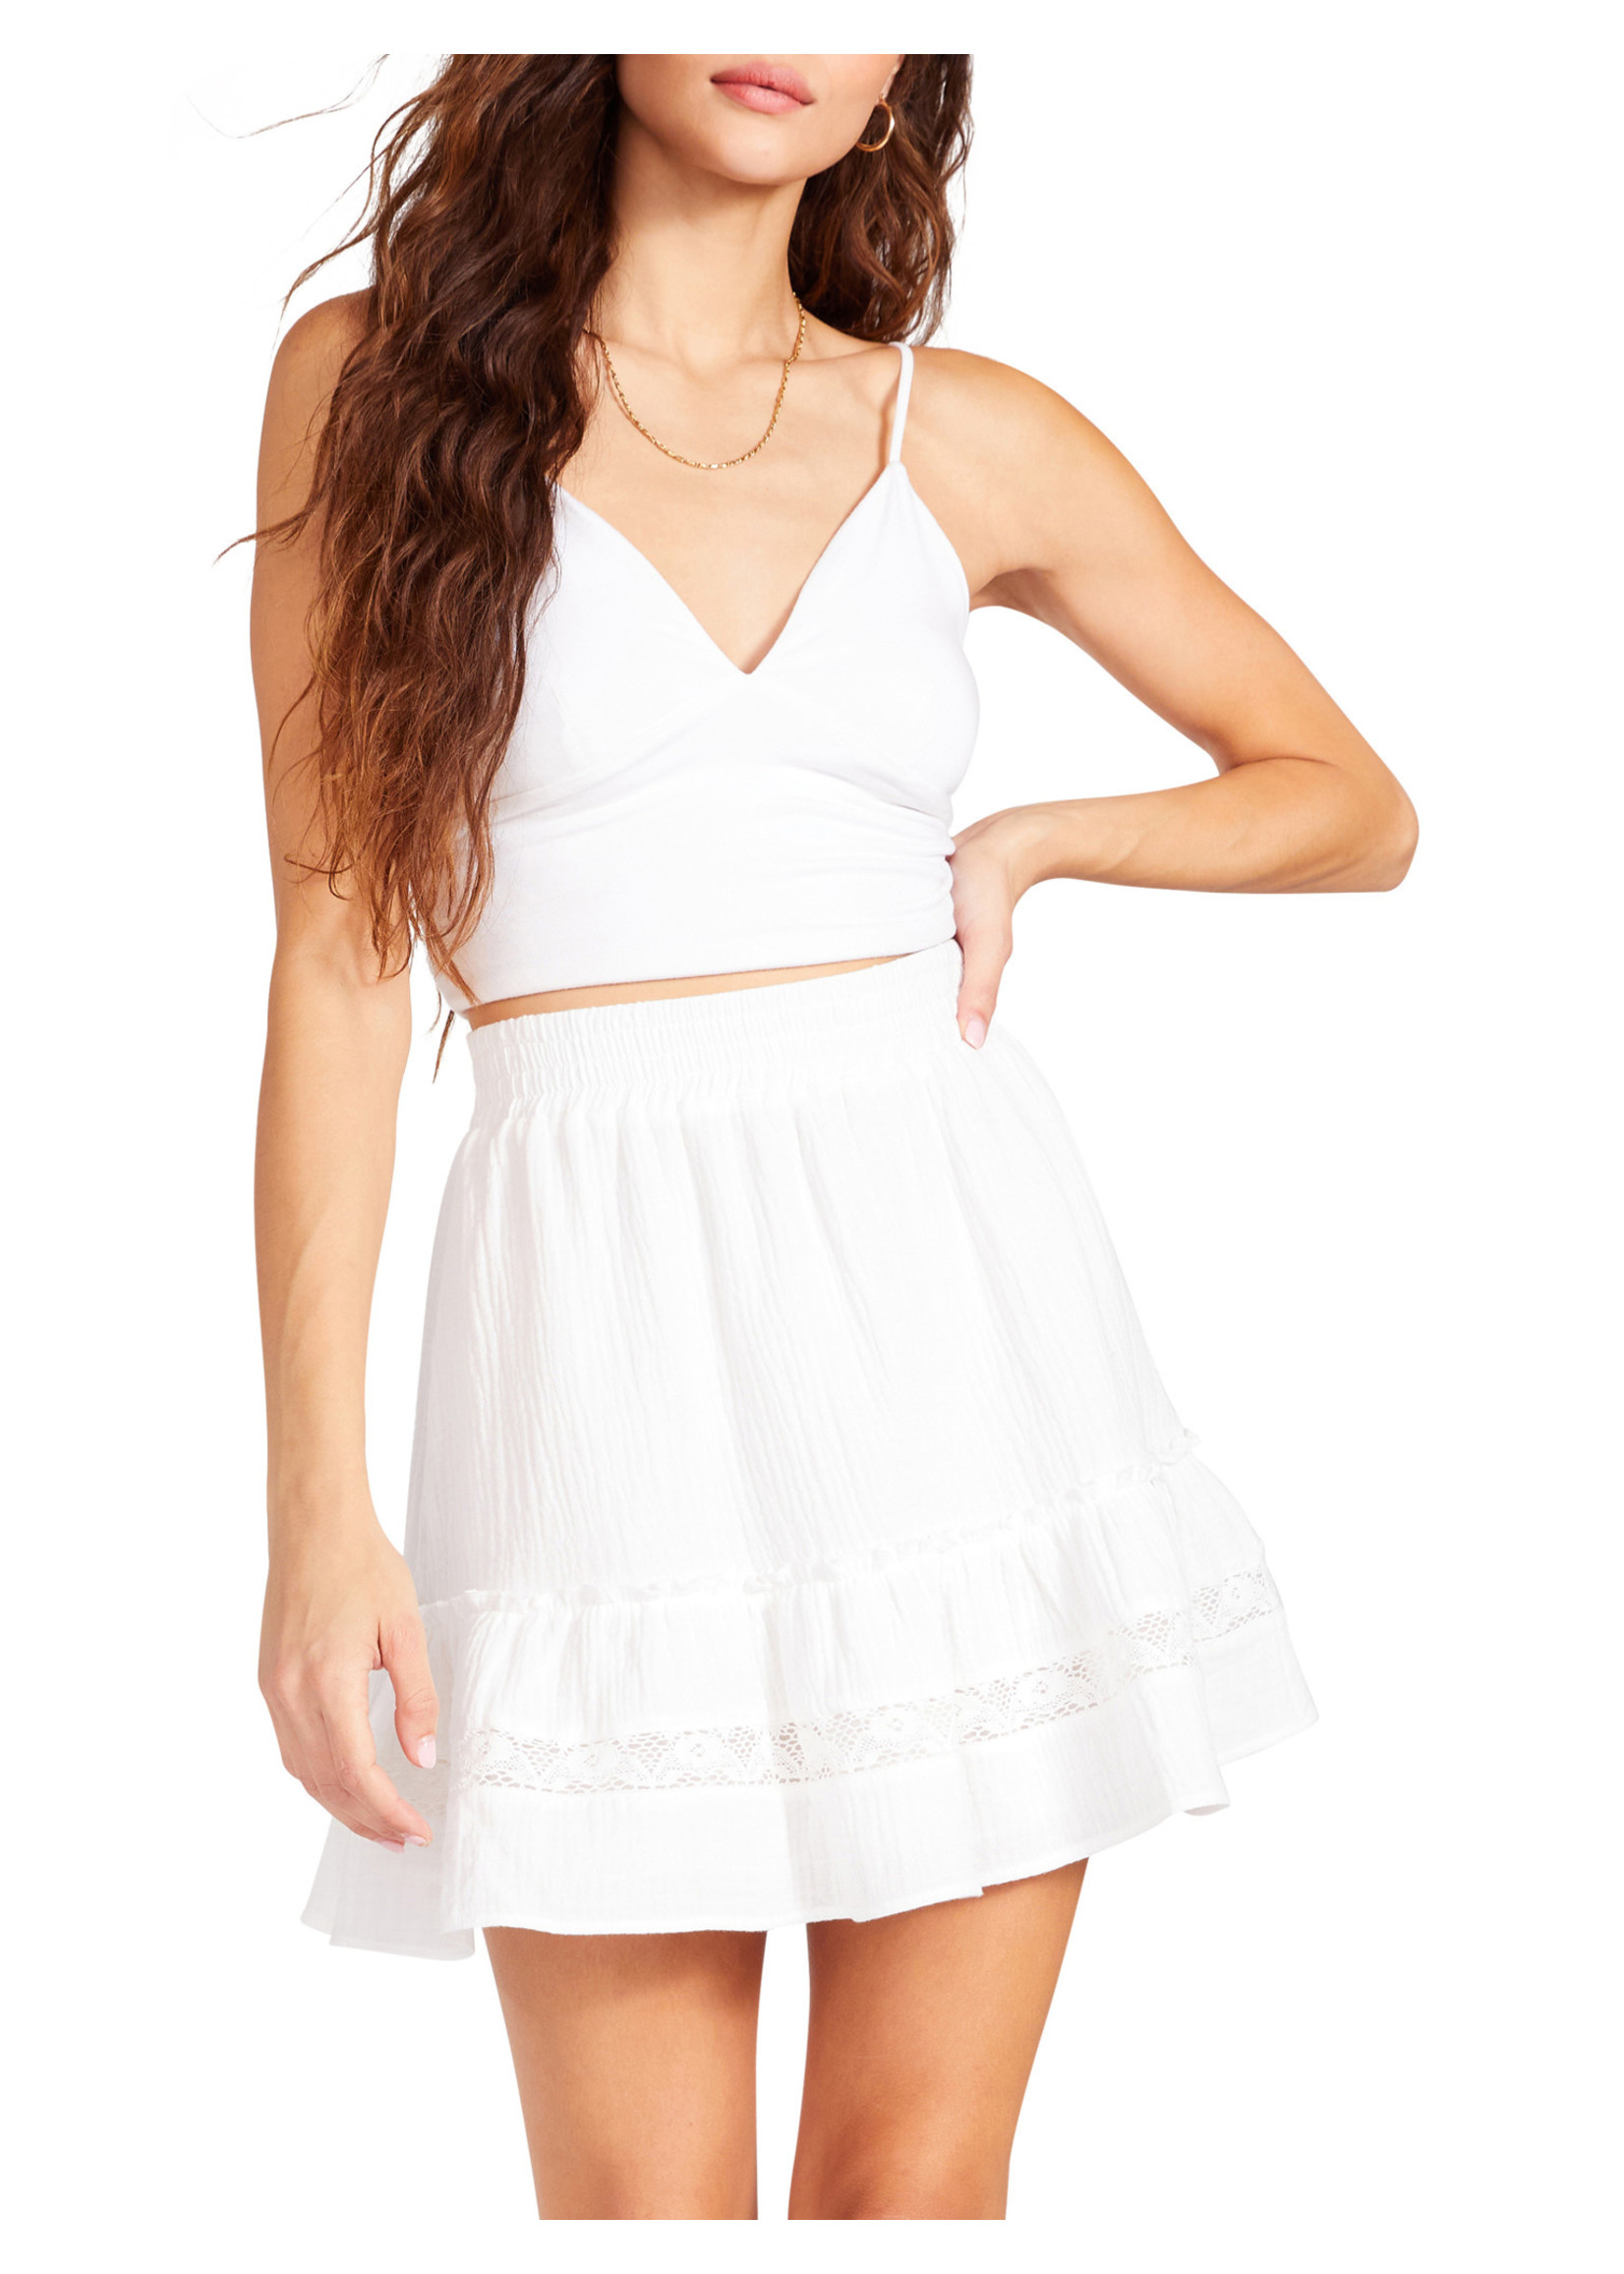 BB Dakota Rosalita Skirt - BL209608